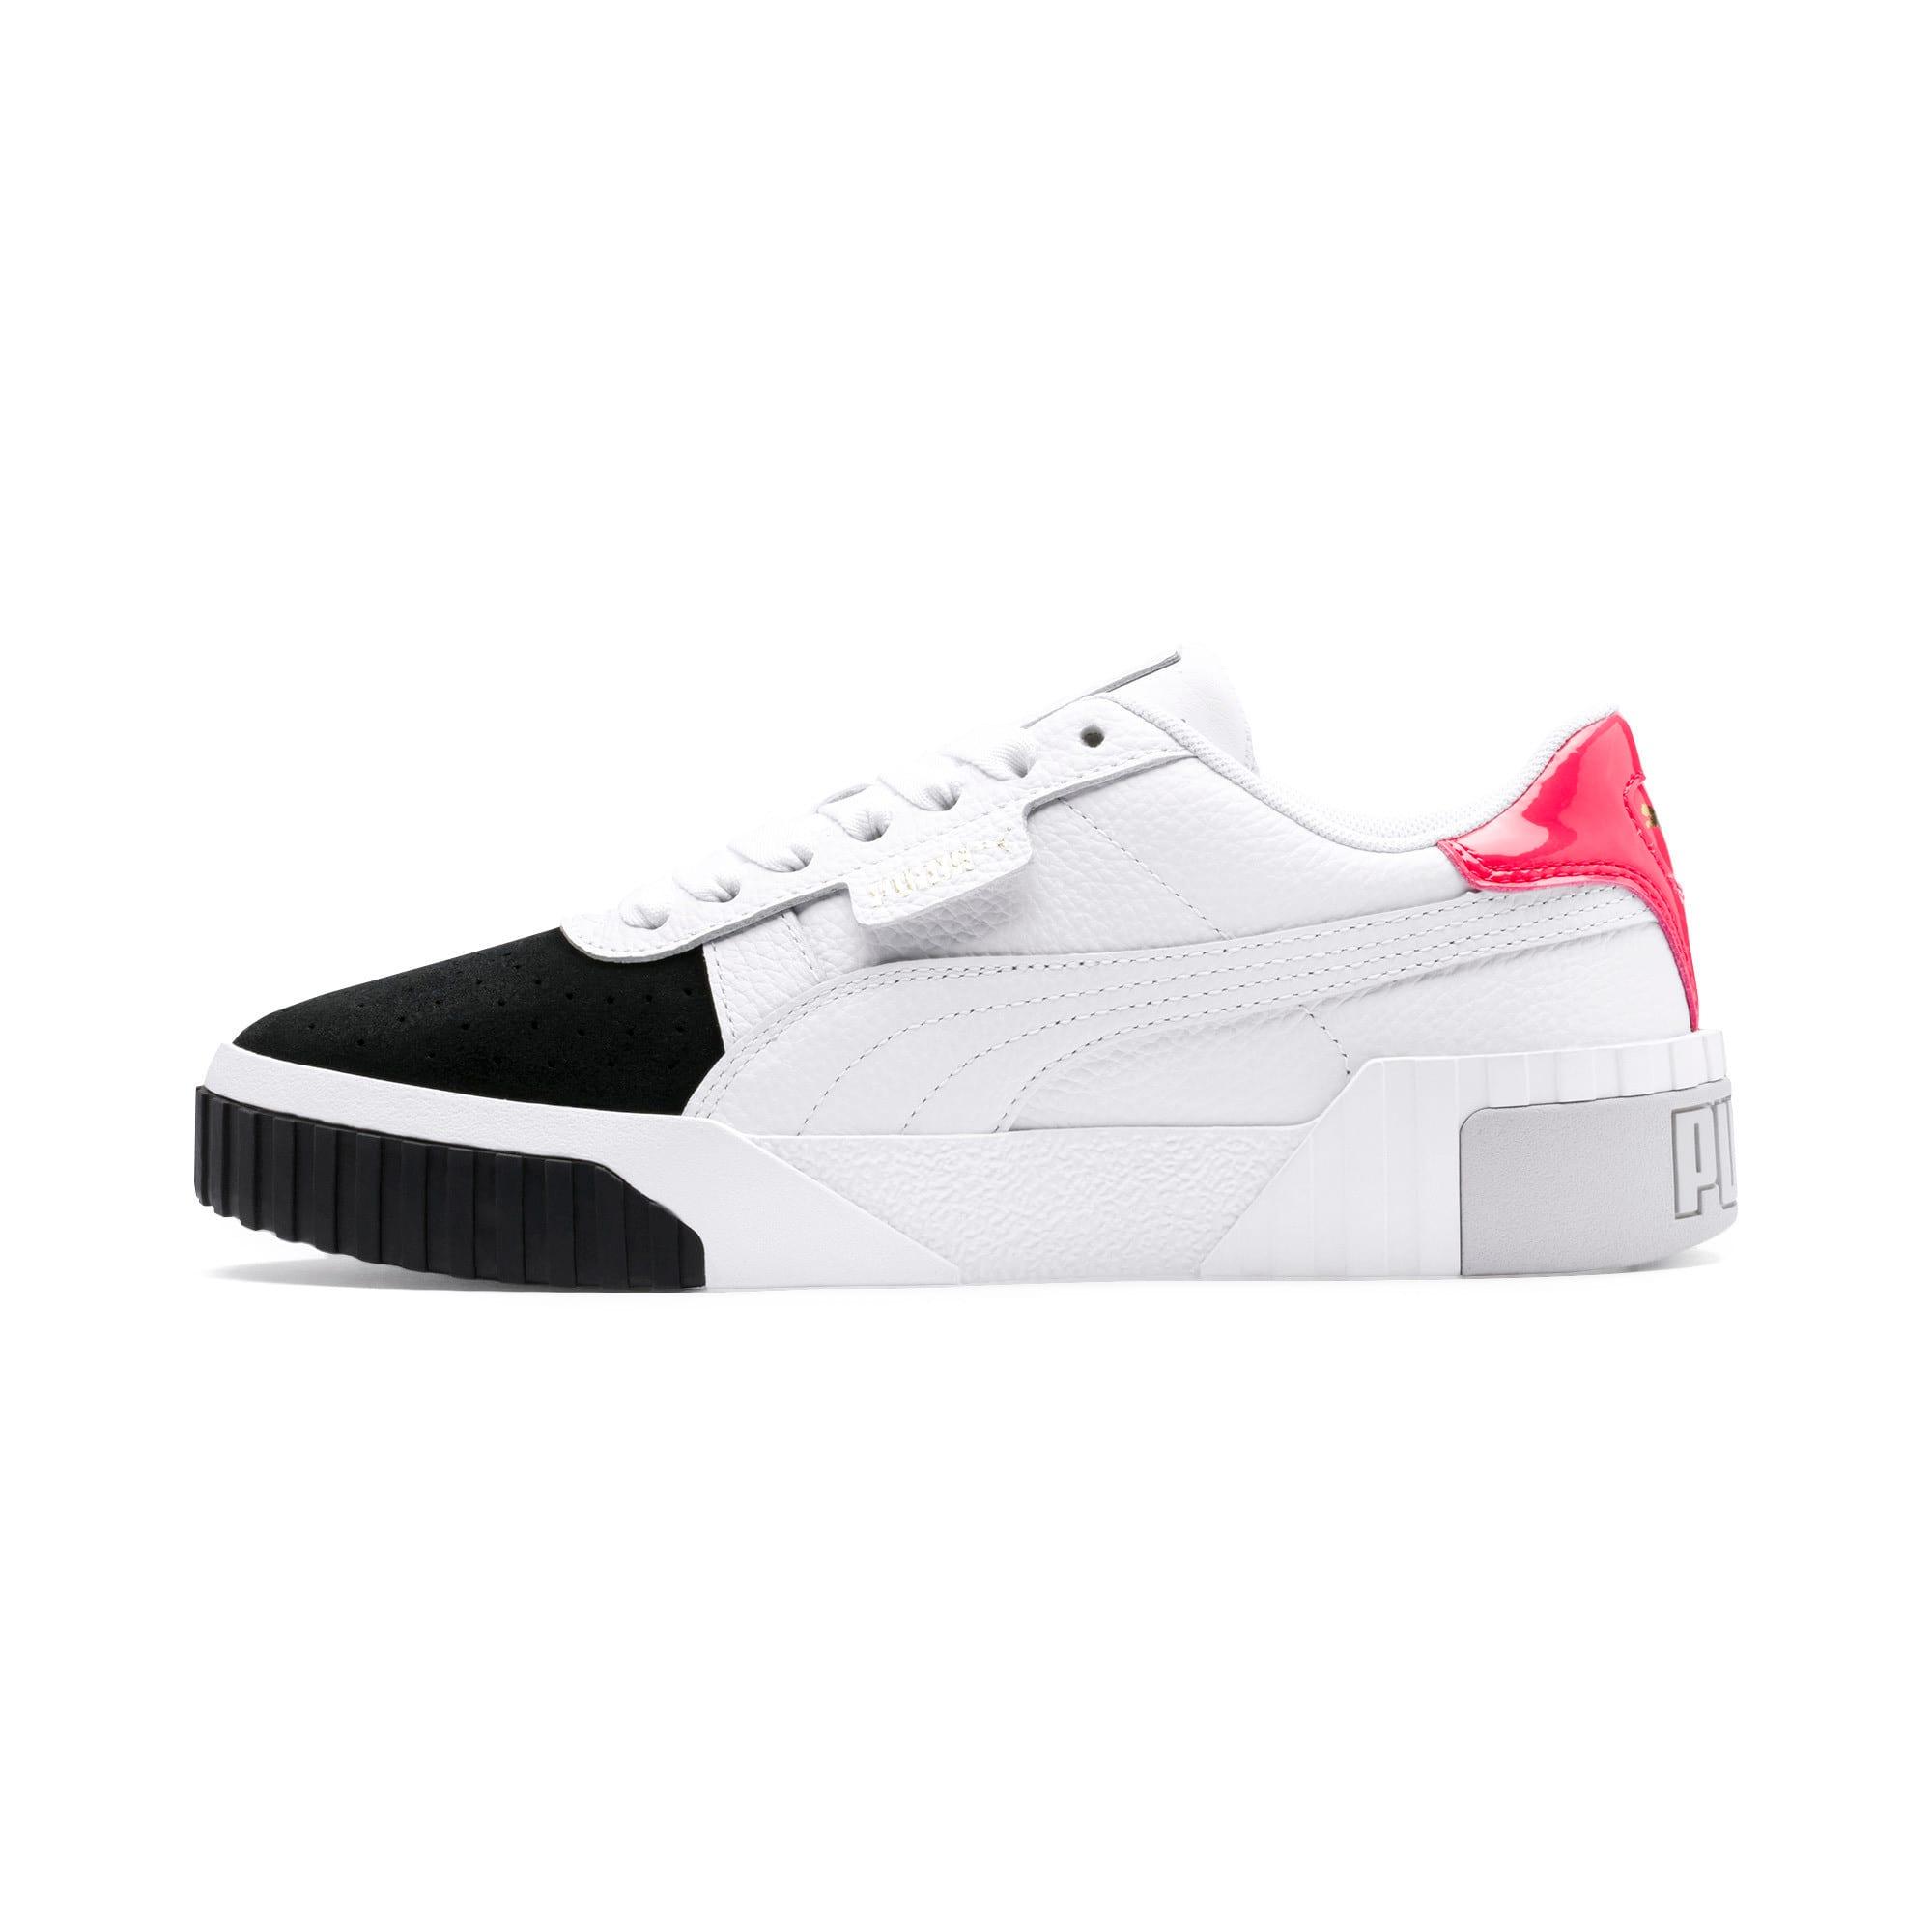 Thumbnail 1 of Cali Remix Women's Sneakers, Puma White-Puma Black, medium